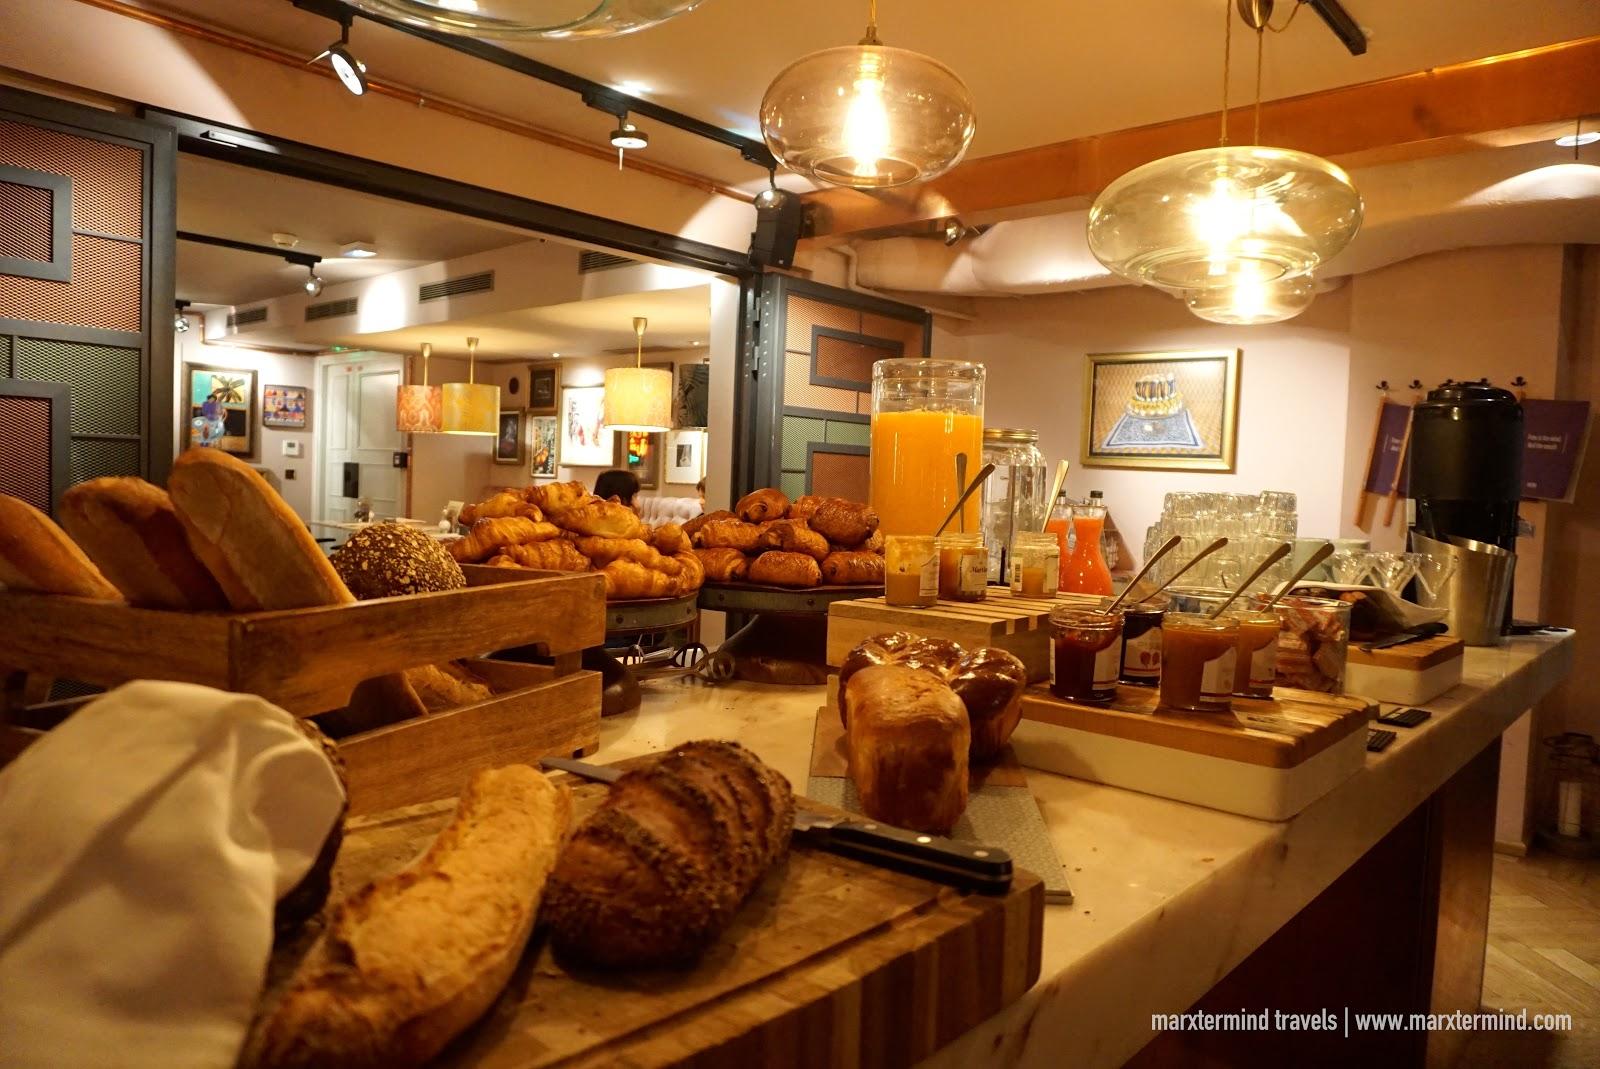 Breakfast spread at Neni Paris